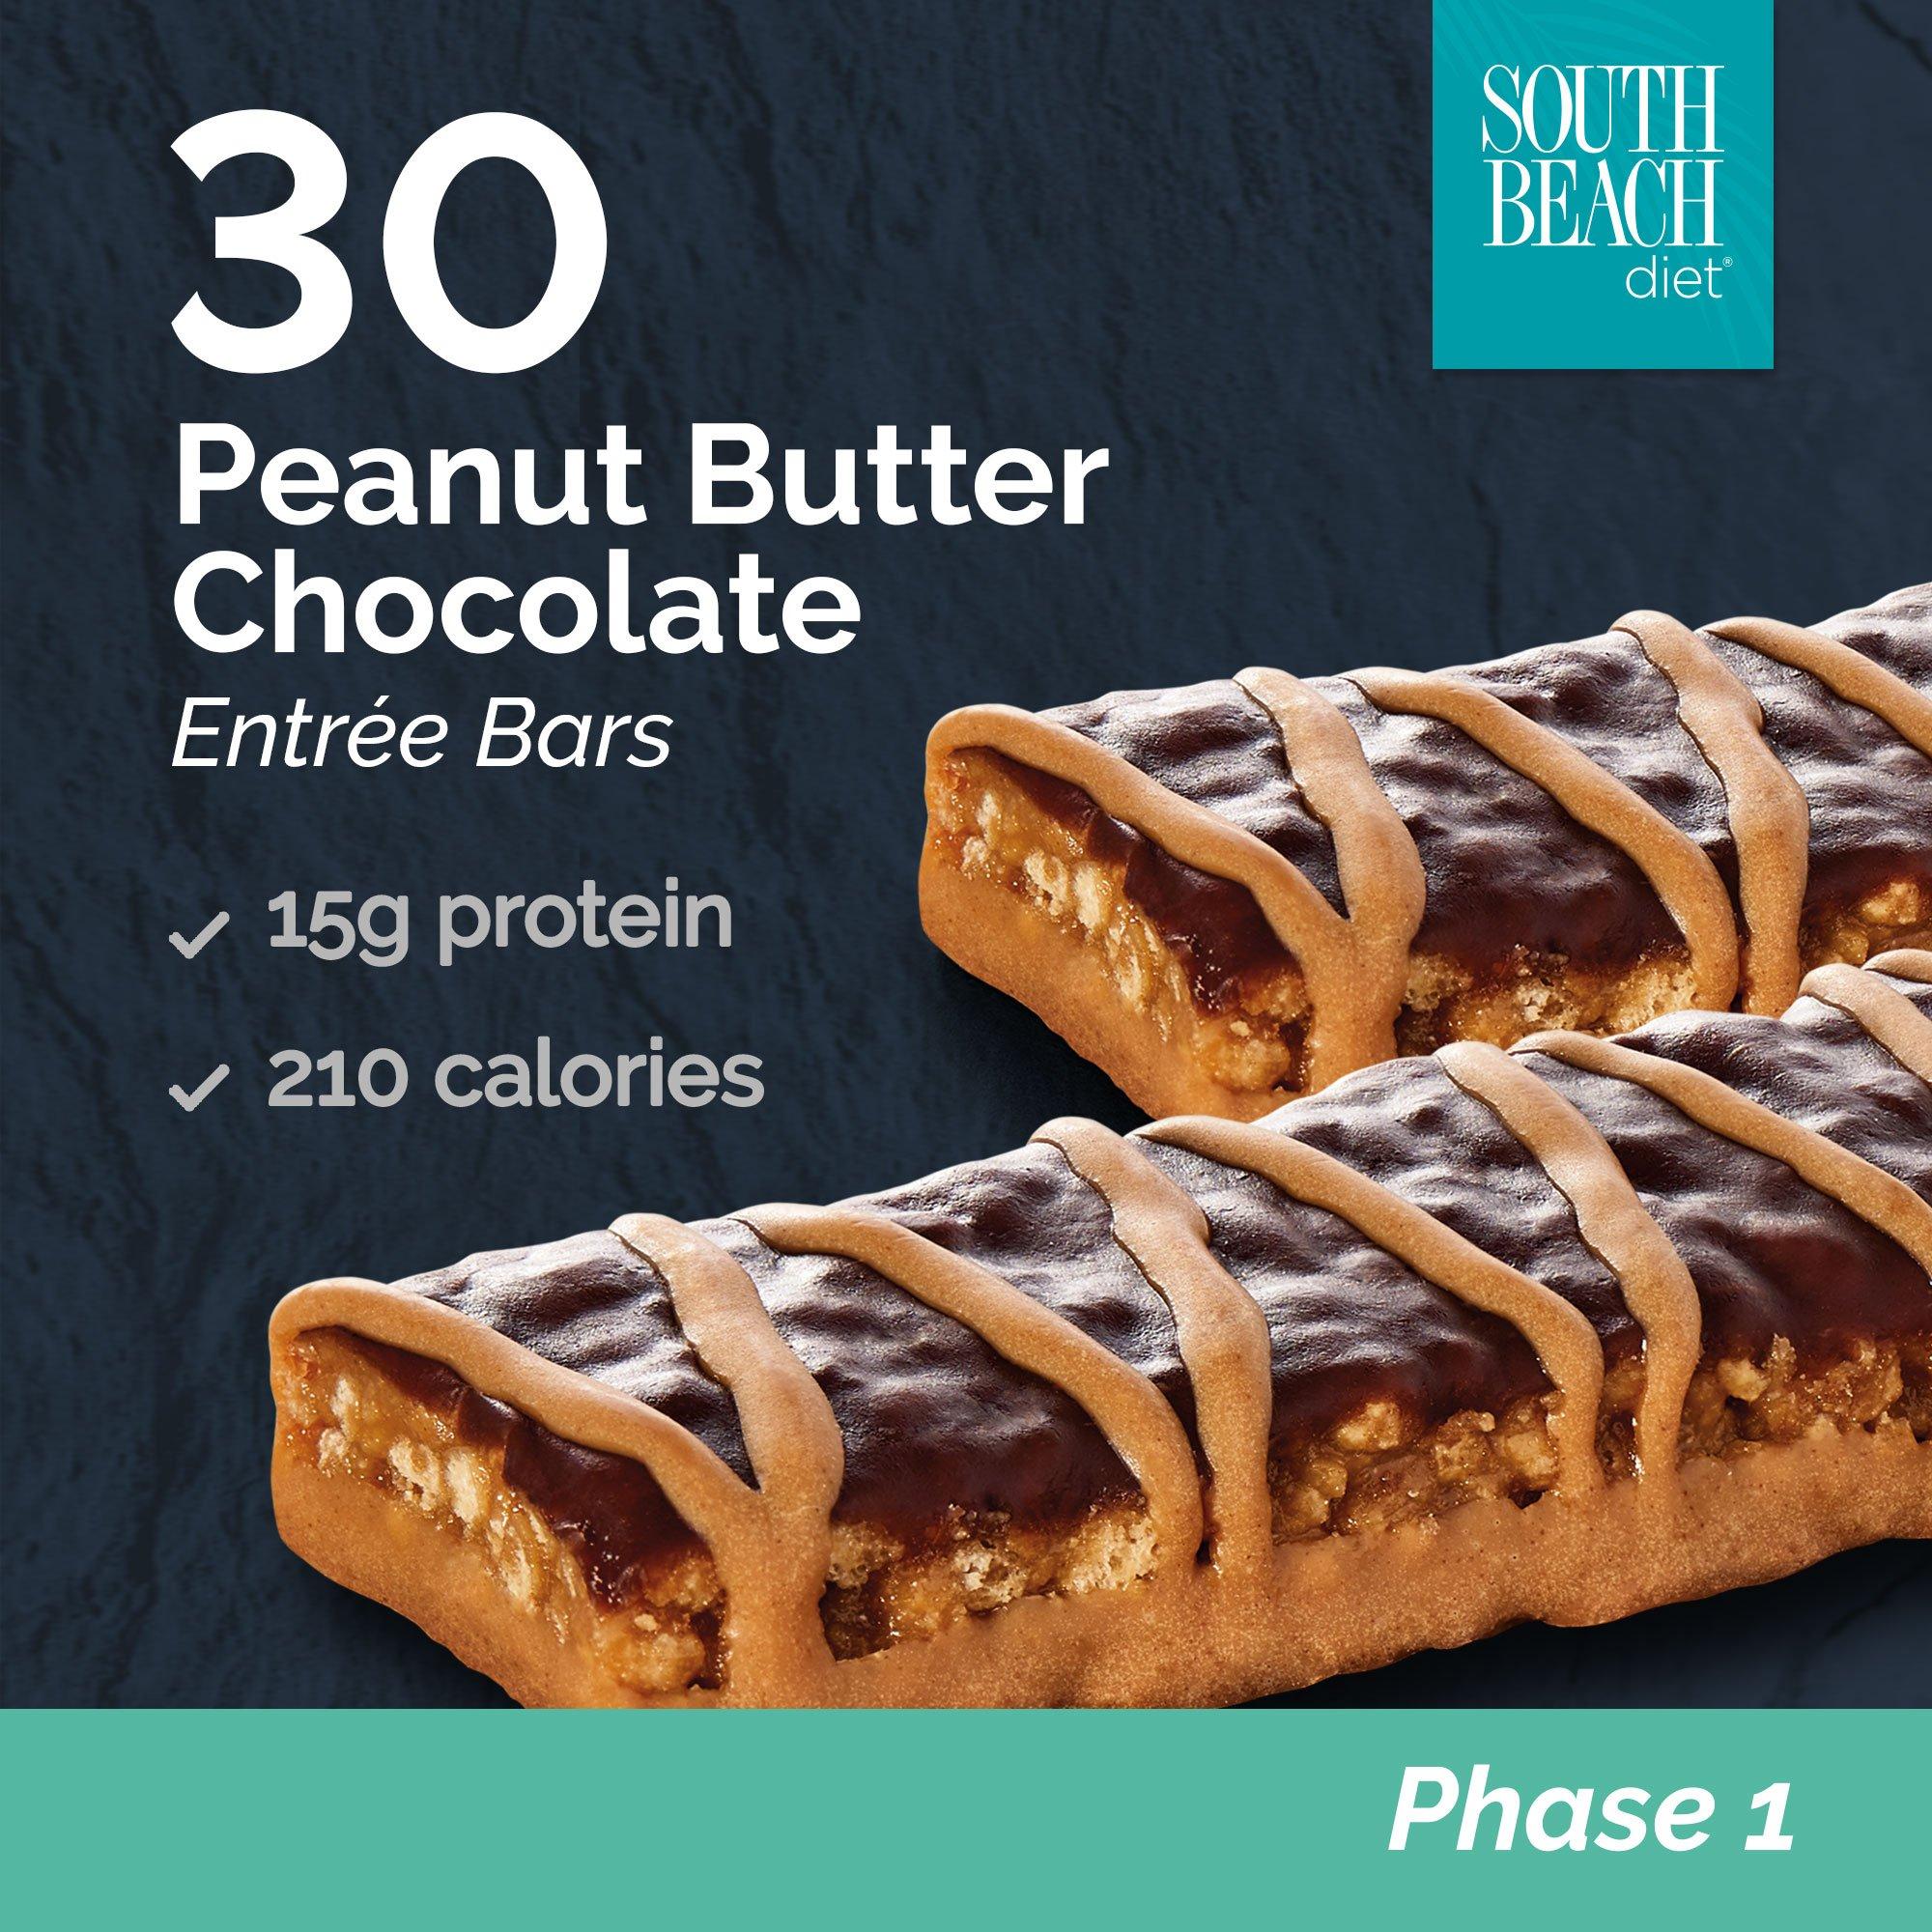 South Beach Diet Peanut Butter Chocolate Bar, 1.8 Oz Bar, 30 Count